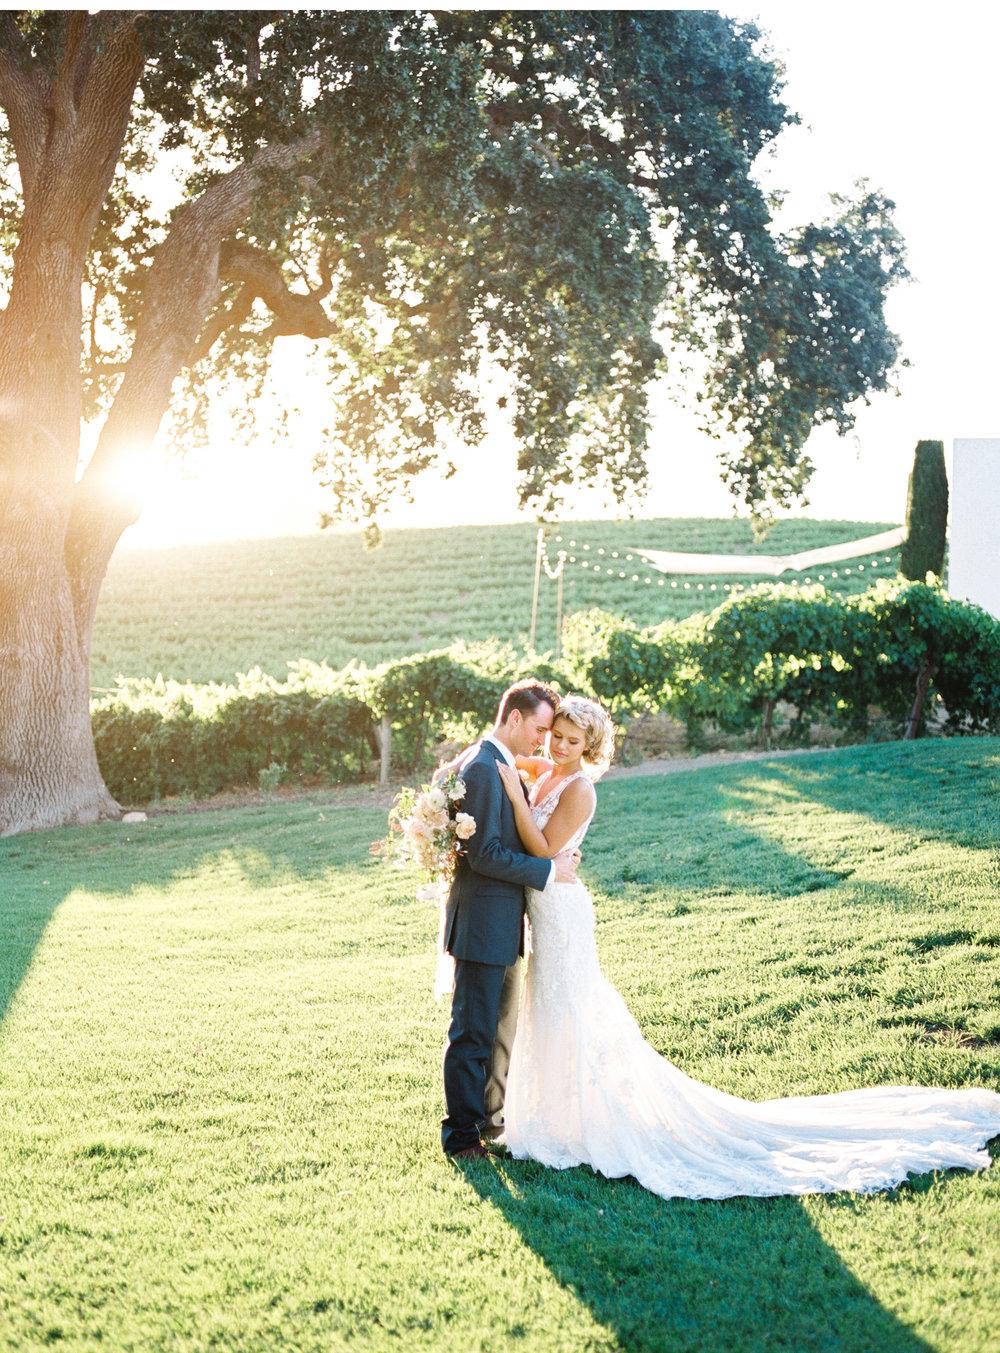 Malibu-Weddings-Natalie-Schutt-Photography_08.jpg